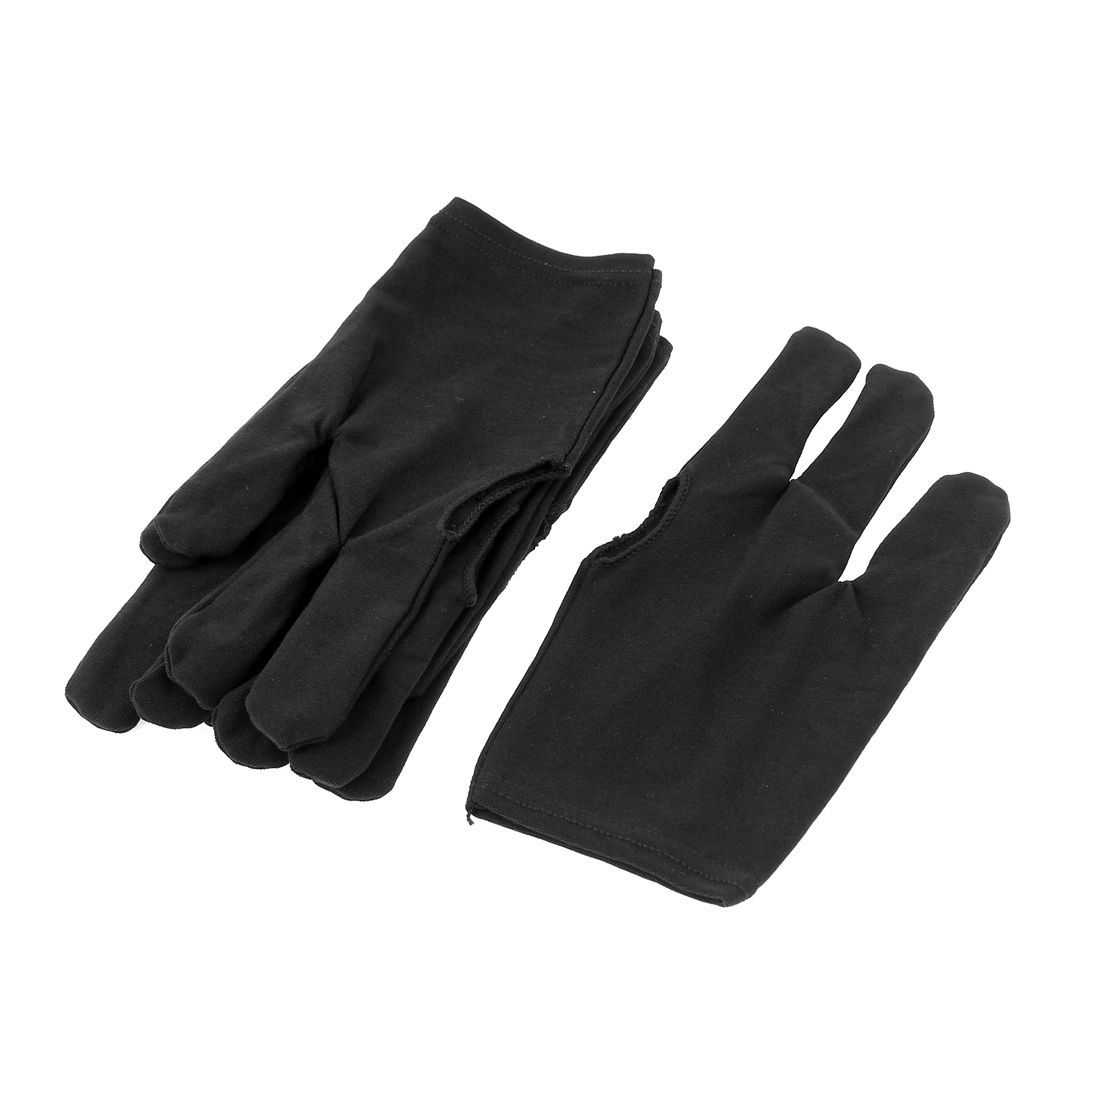 Black Elastic Snooker Billiard Pool Cue Three Finger Gloves 3 Pairs